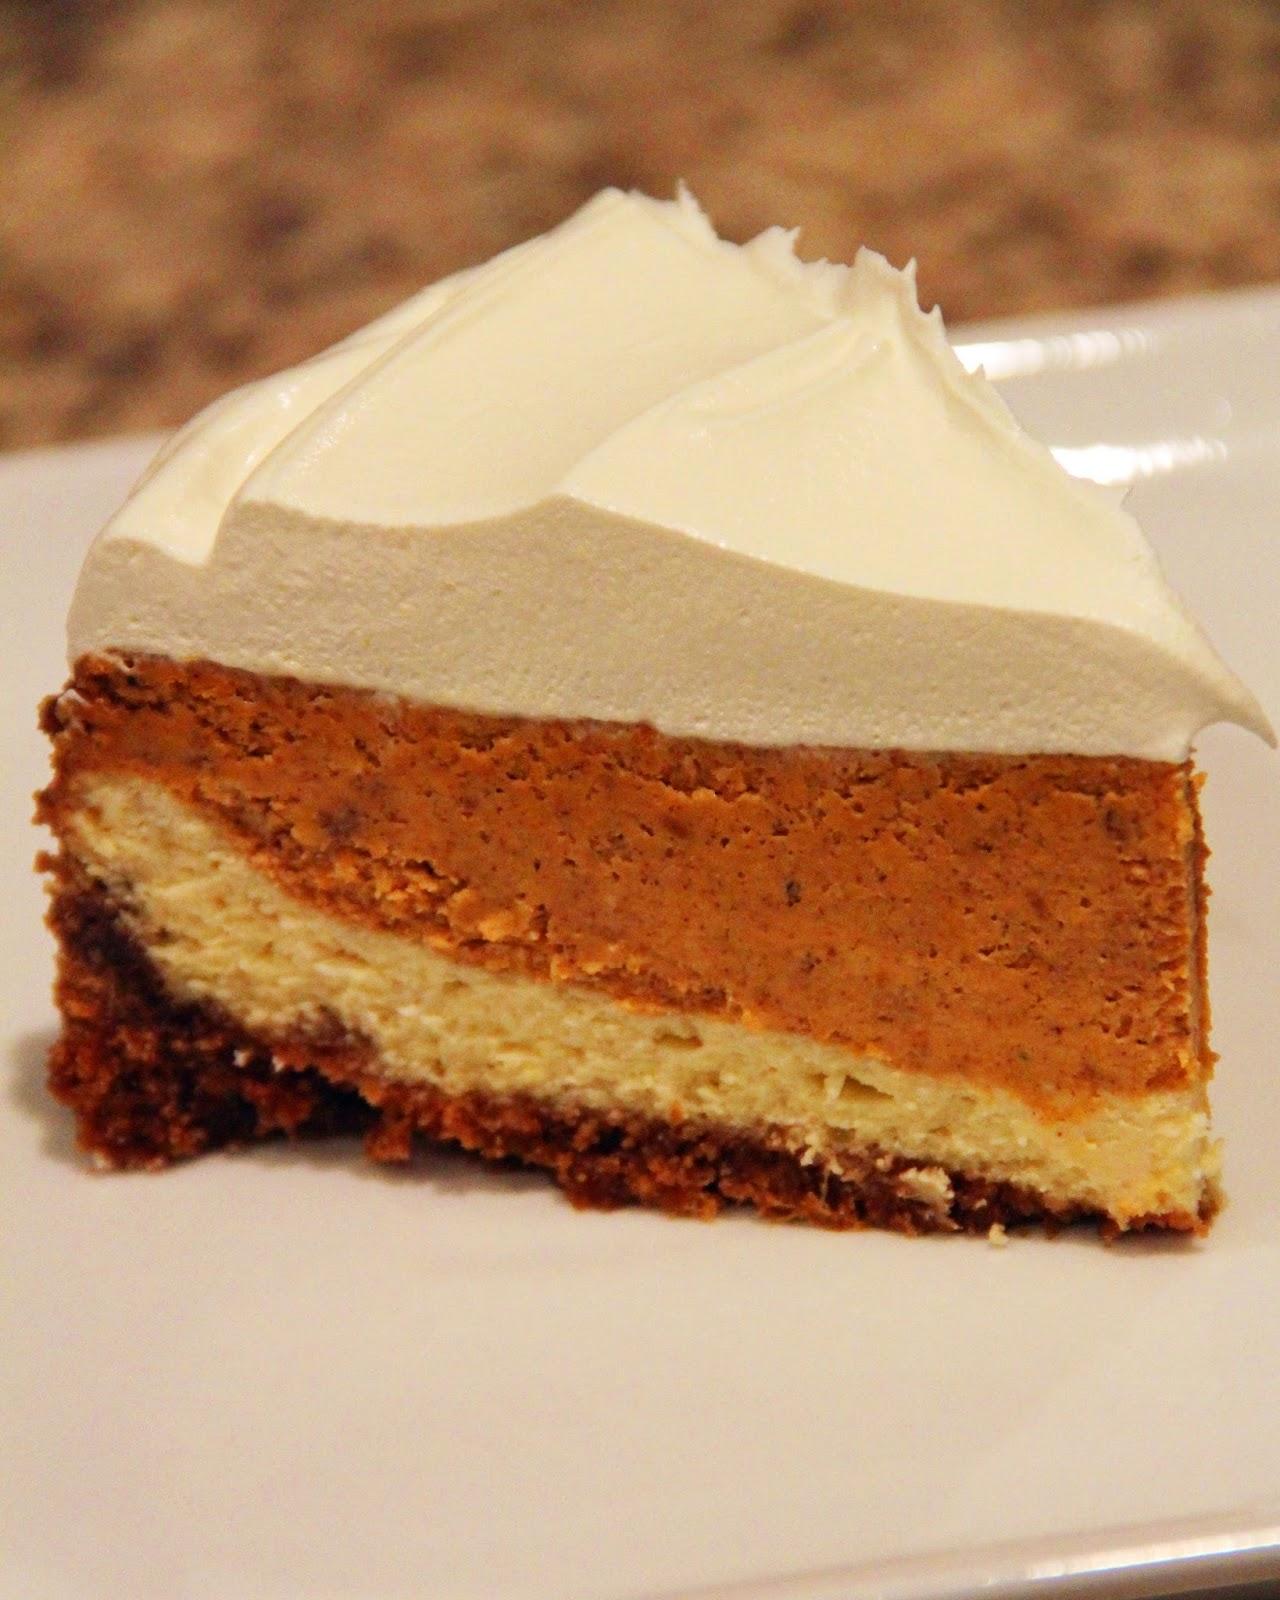 Jo and Sue: Layered Pumpkin Cheesecake